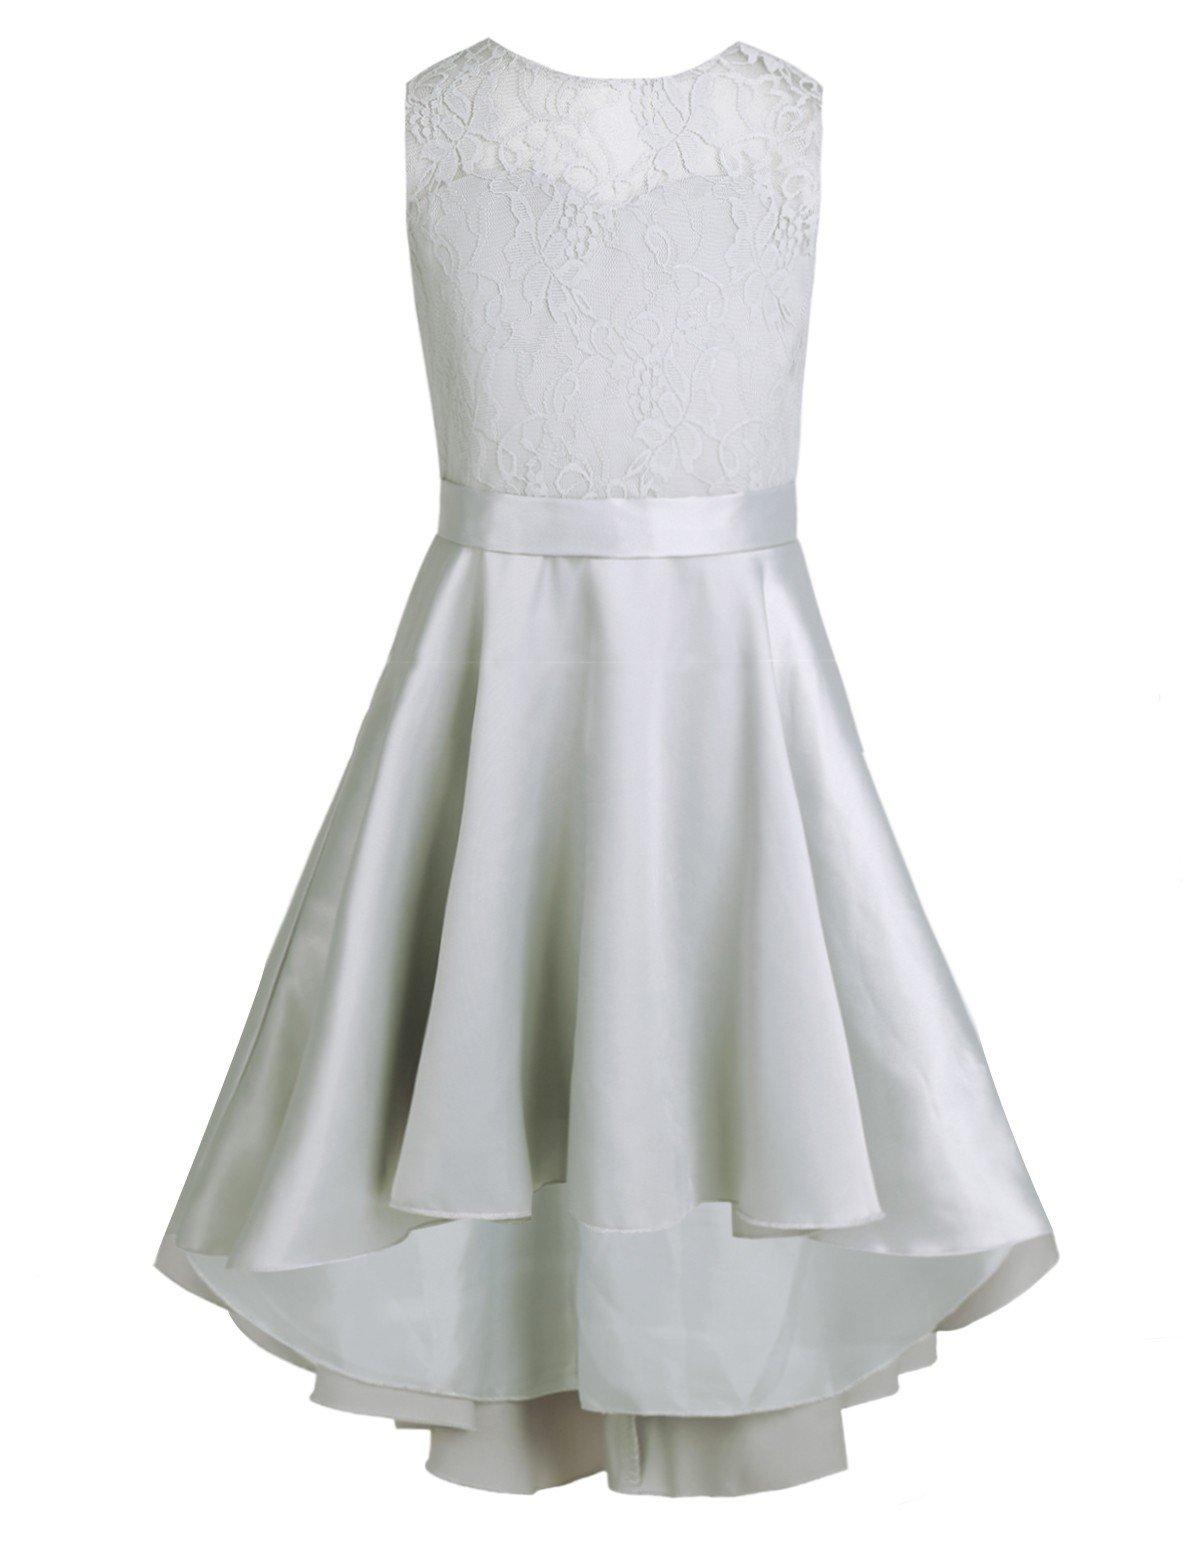 YiZYiF Big Girls Princess Wedding Dance Ball Gown Party V-Back Lace Dress With High Low Hem Gray 12